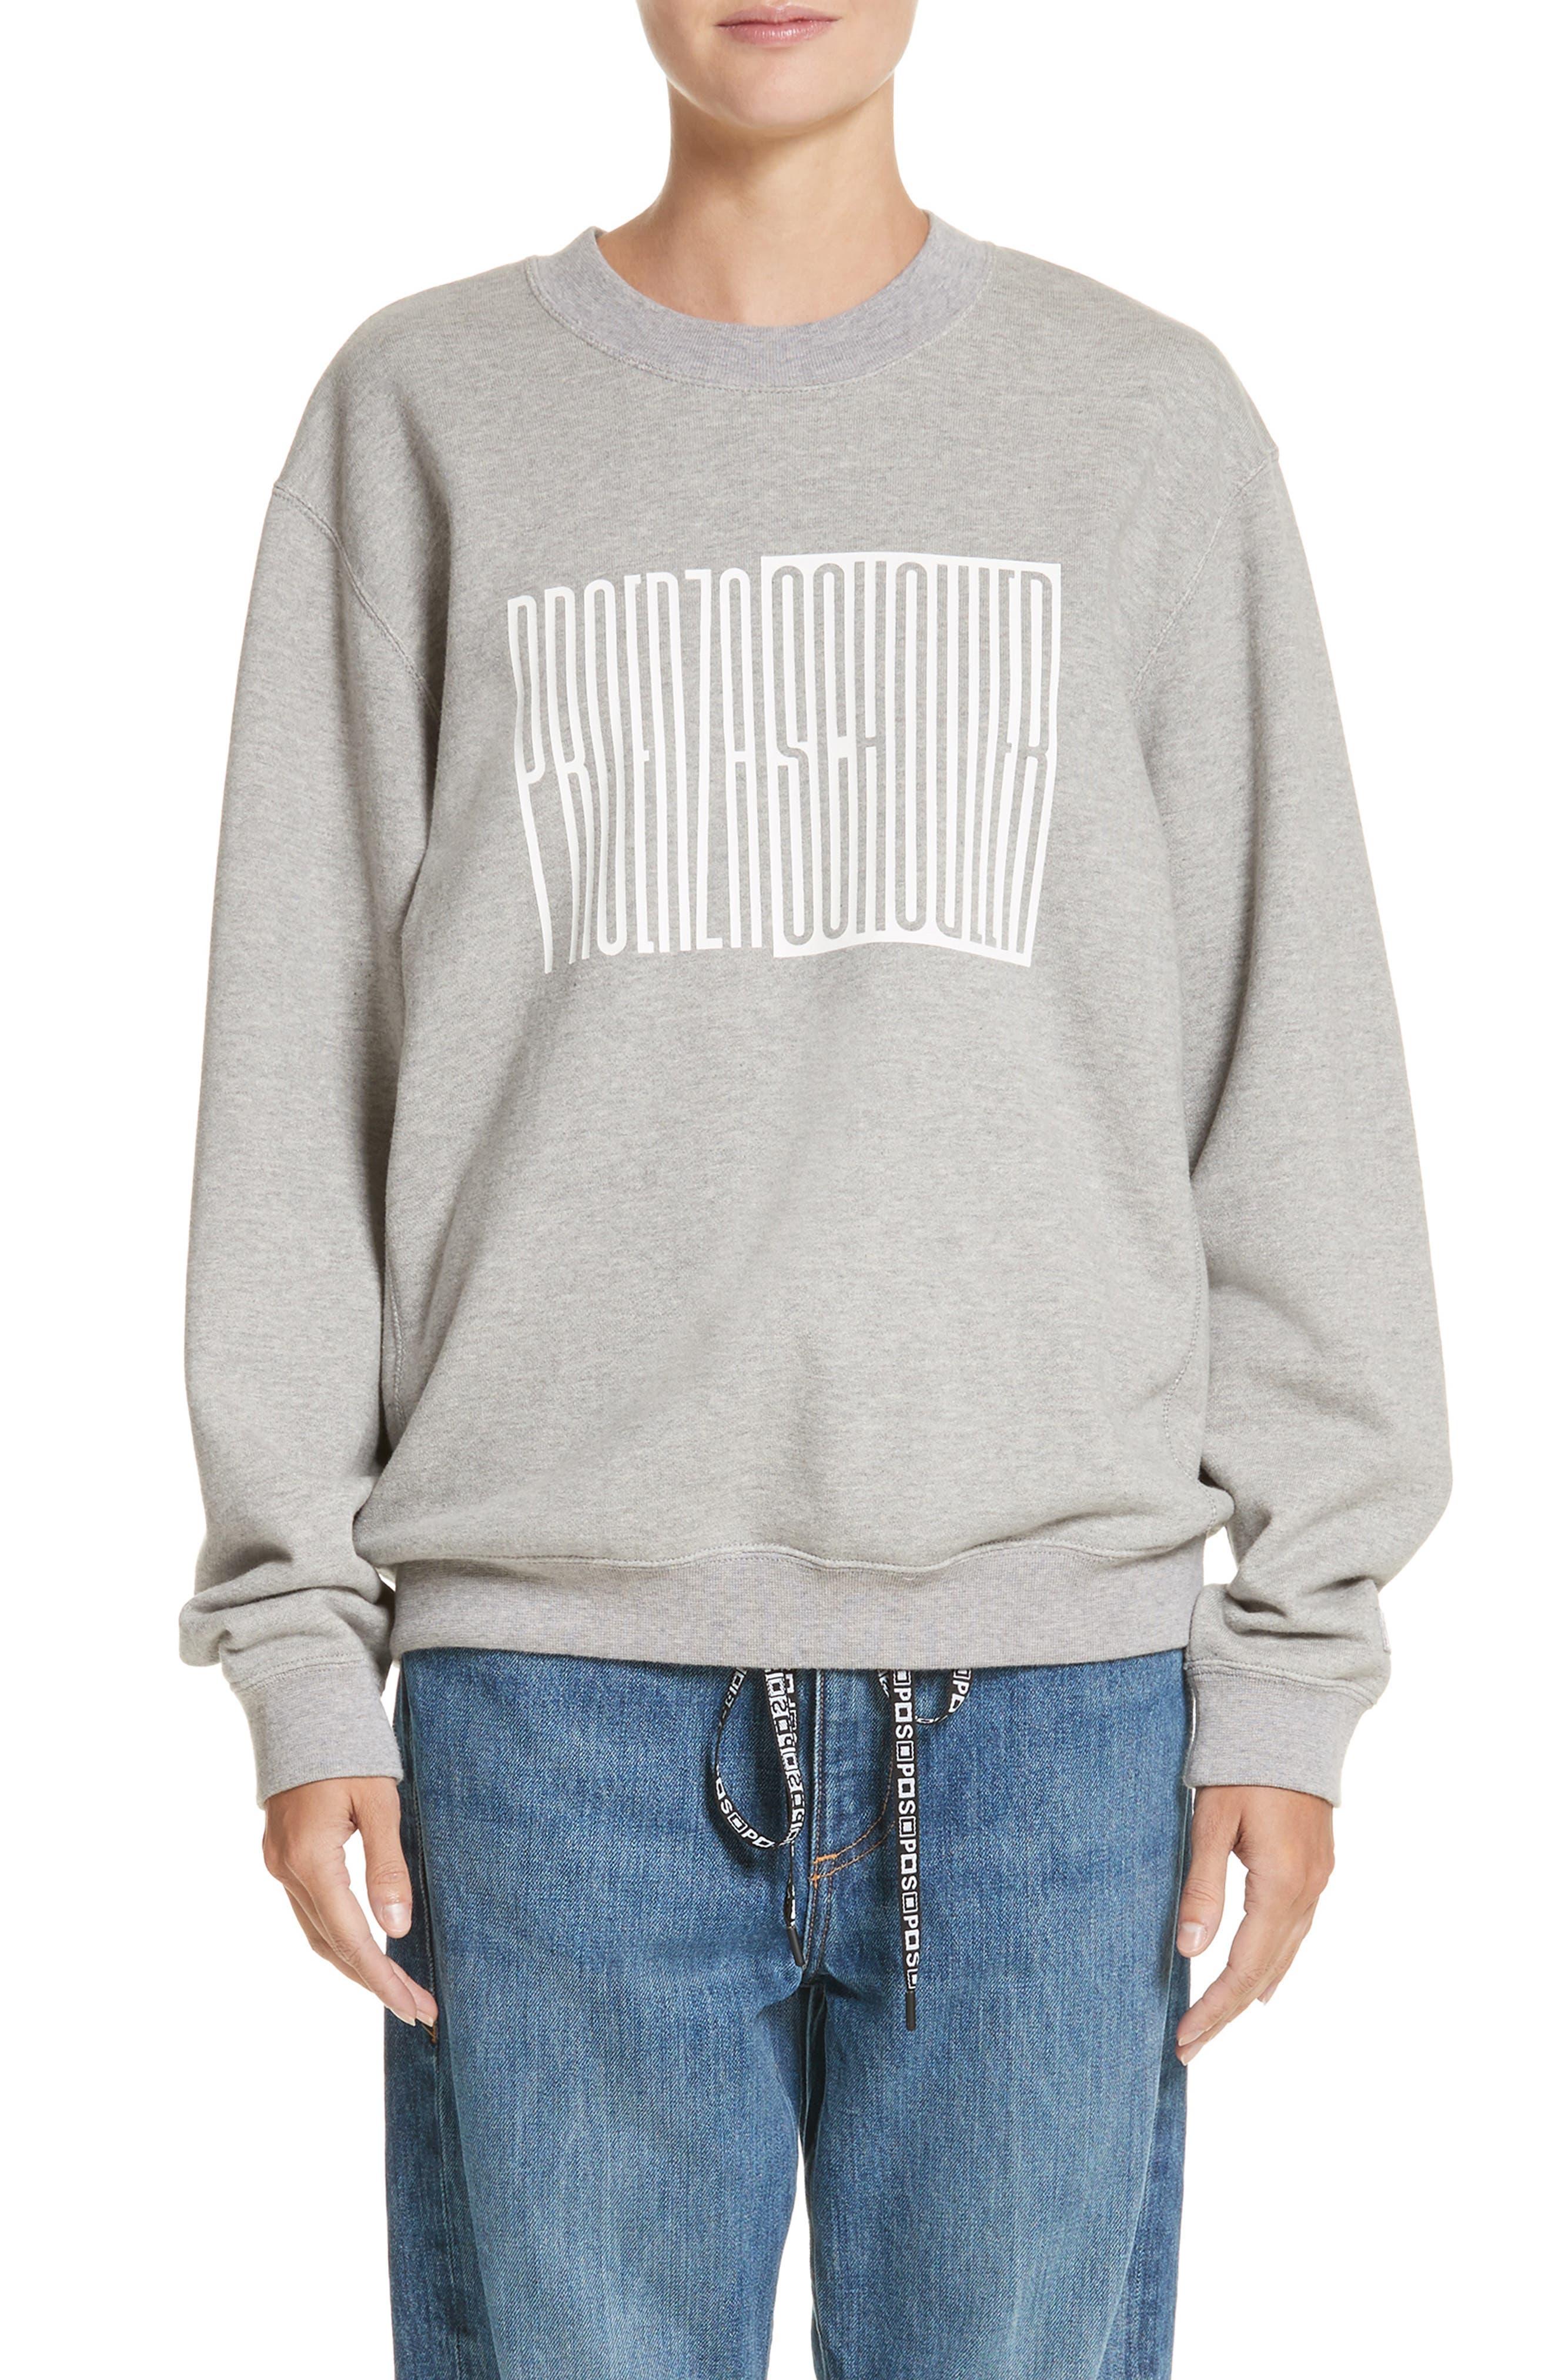 PSWL Graphic Jersey Oversize Sweatshirt,                         Main,                         color, 082